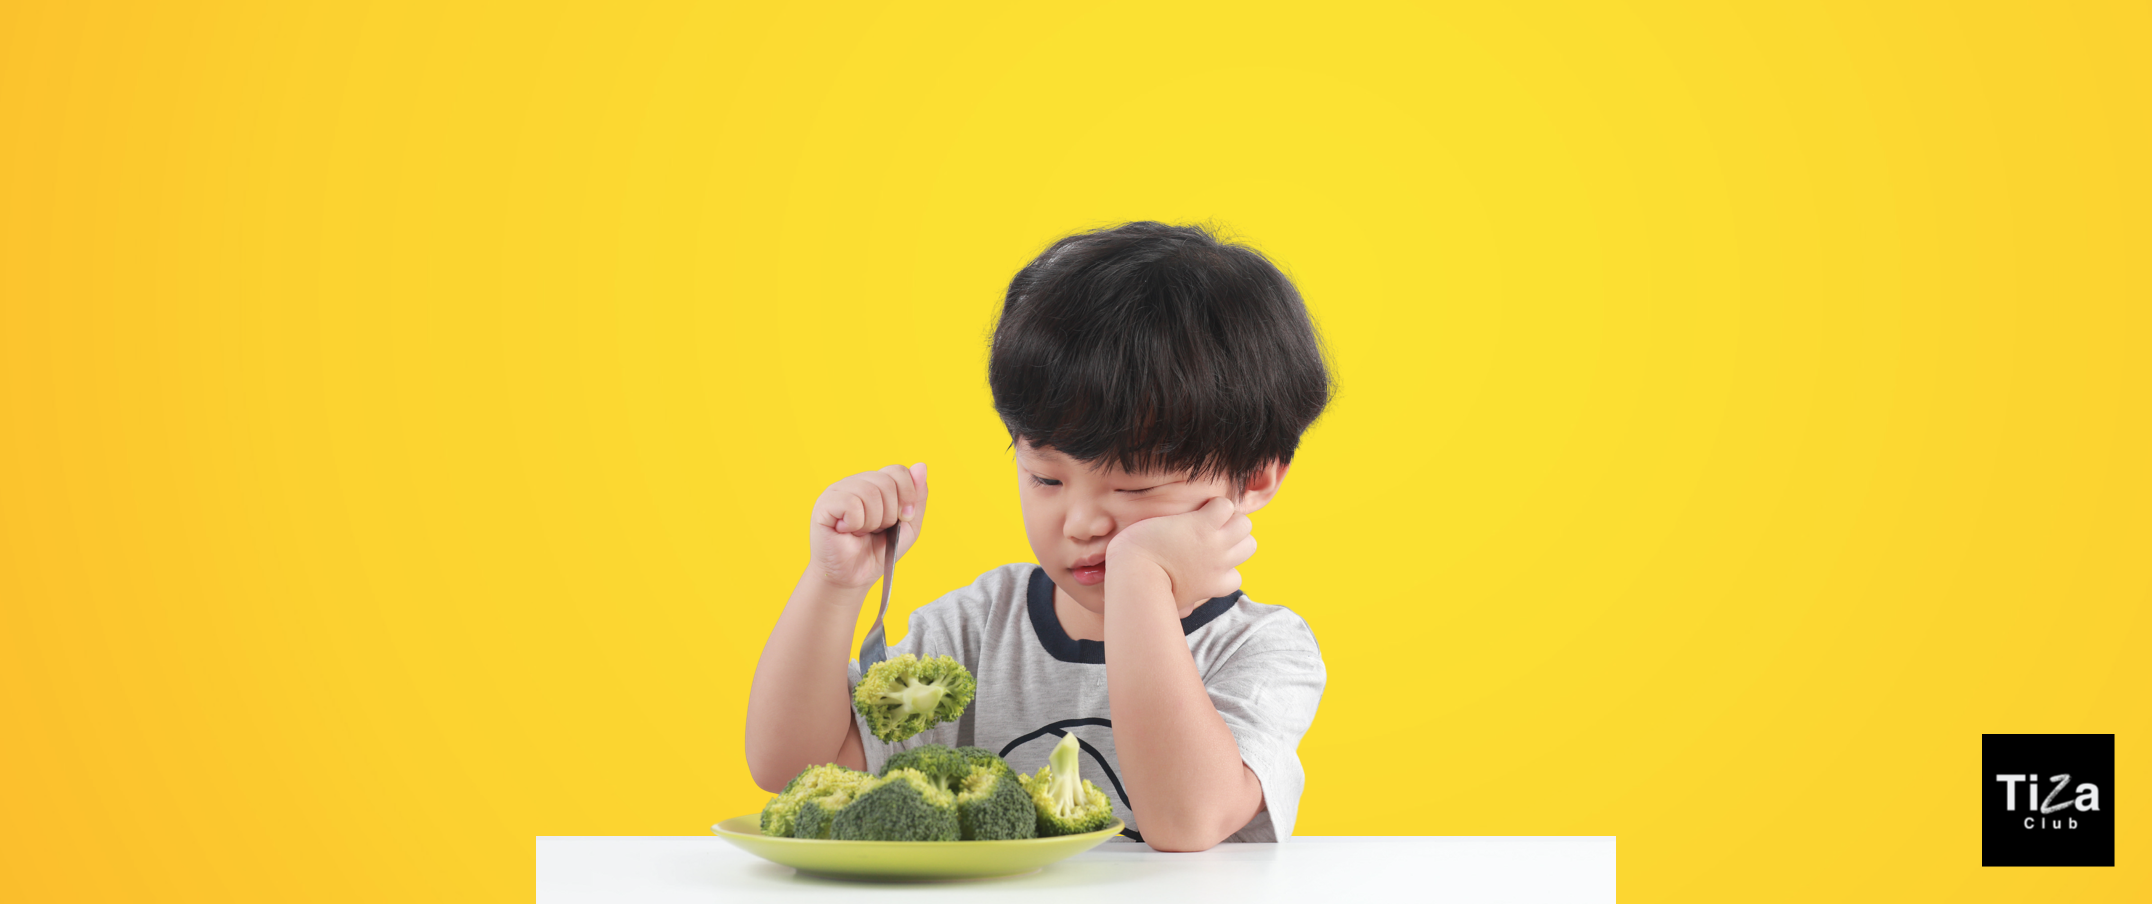 Picky eater – Mi hijo no come